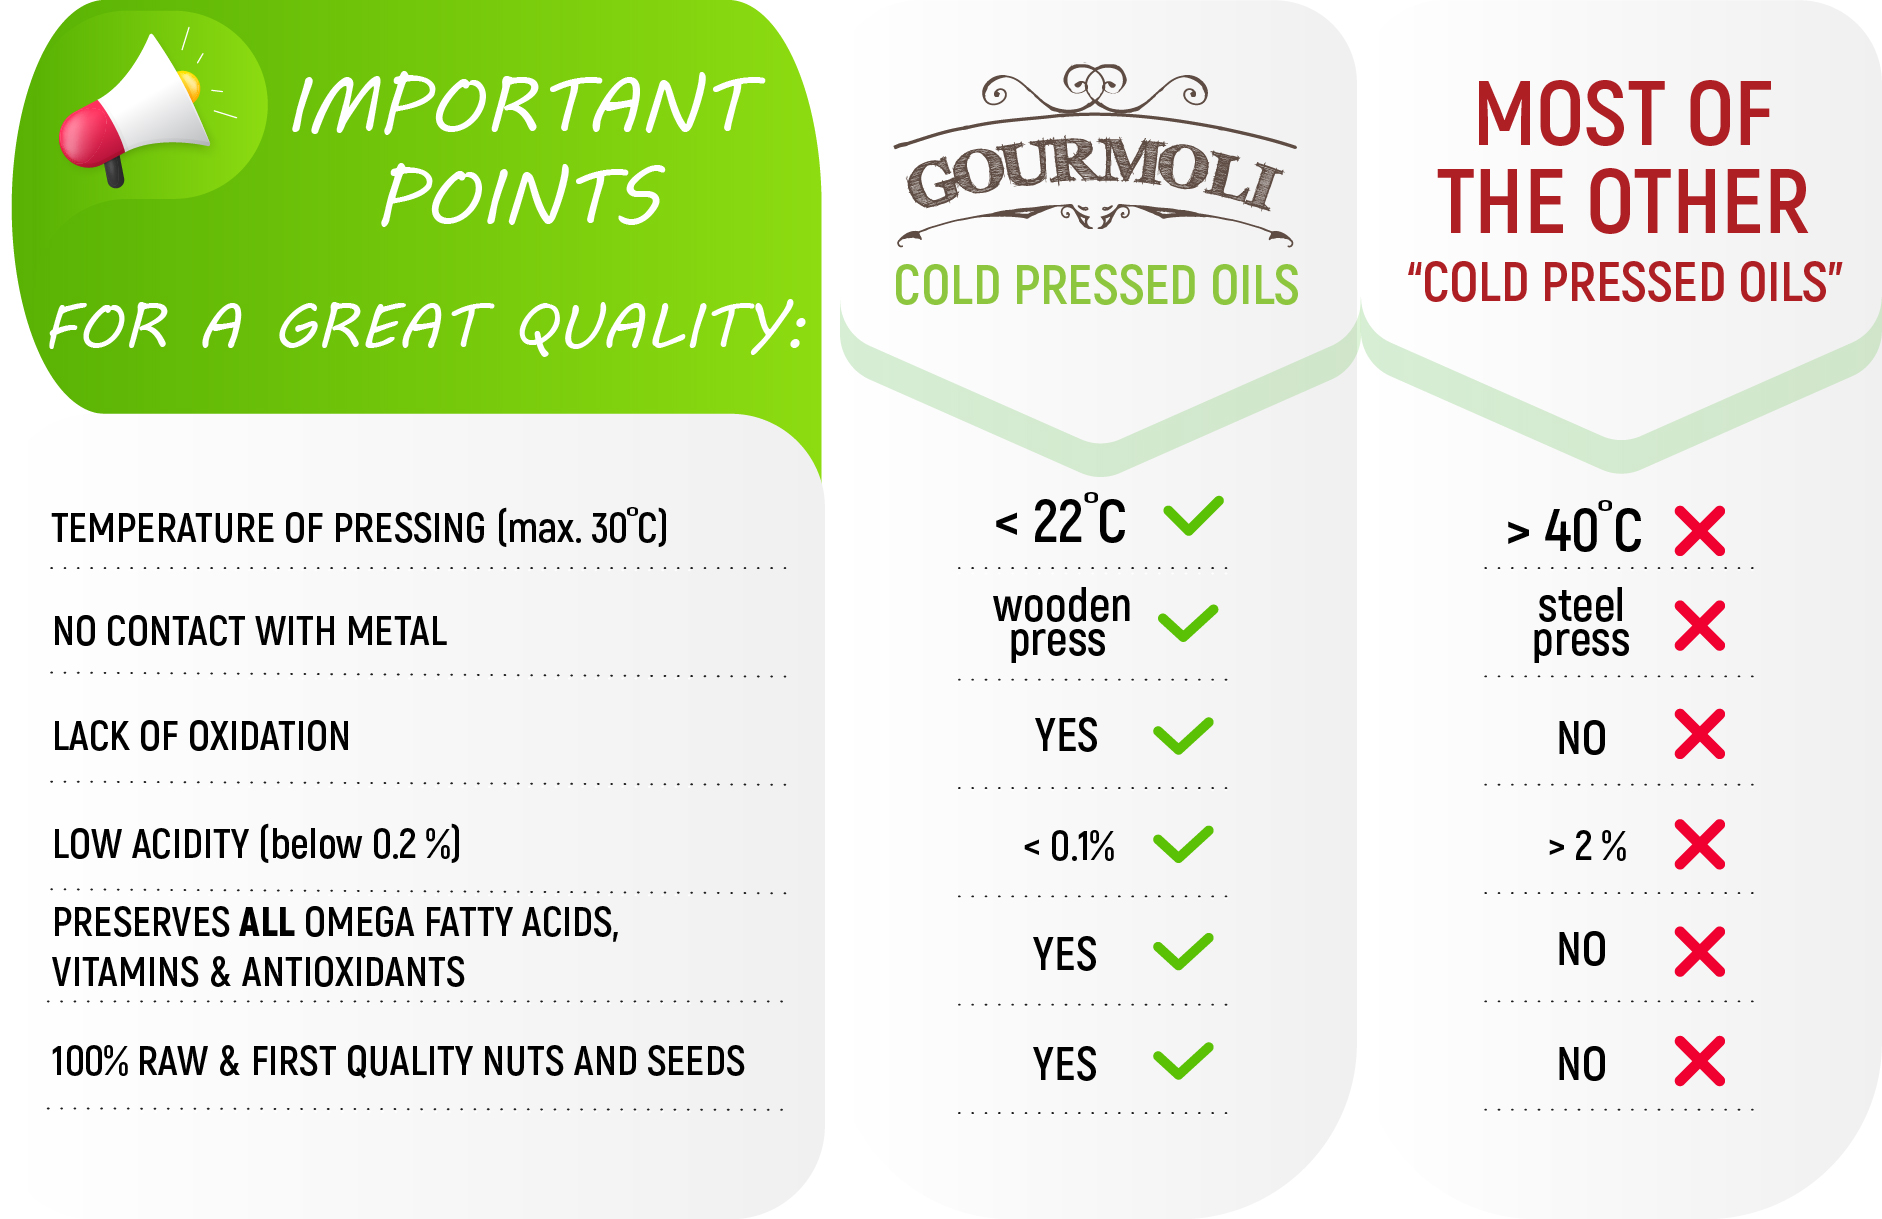 Benefits of Gourmoli EN cut